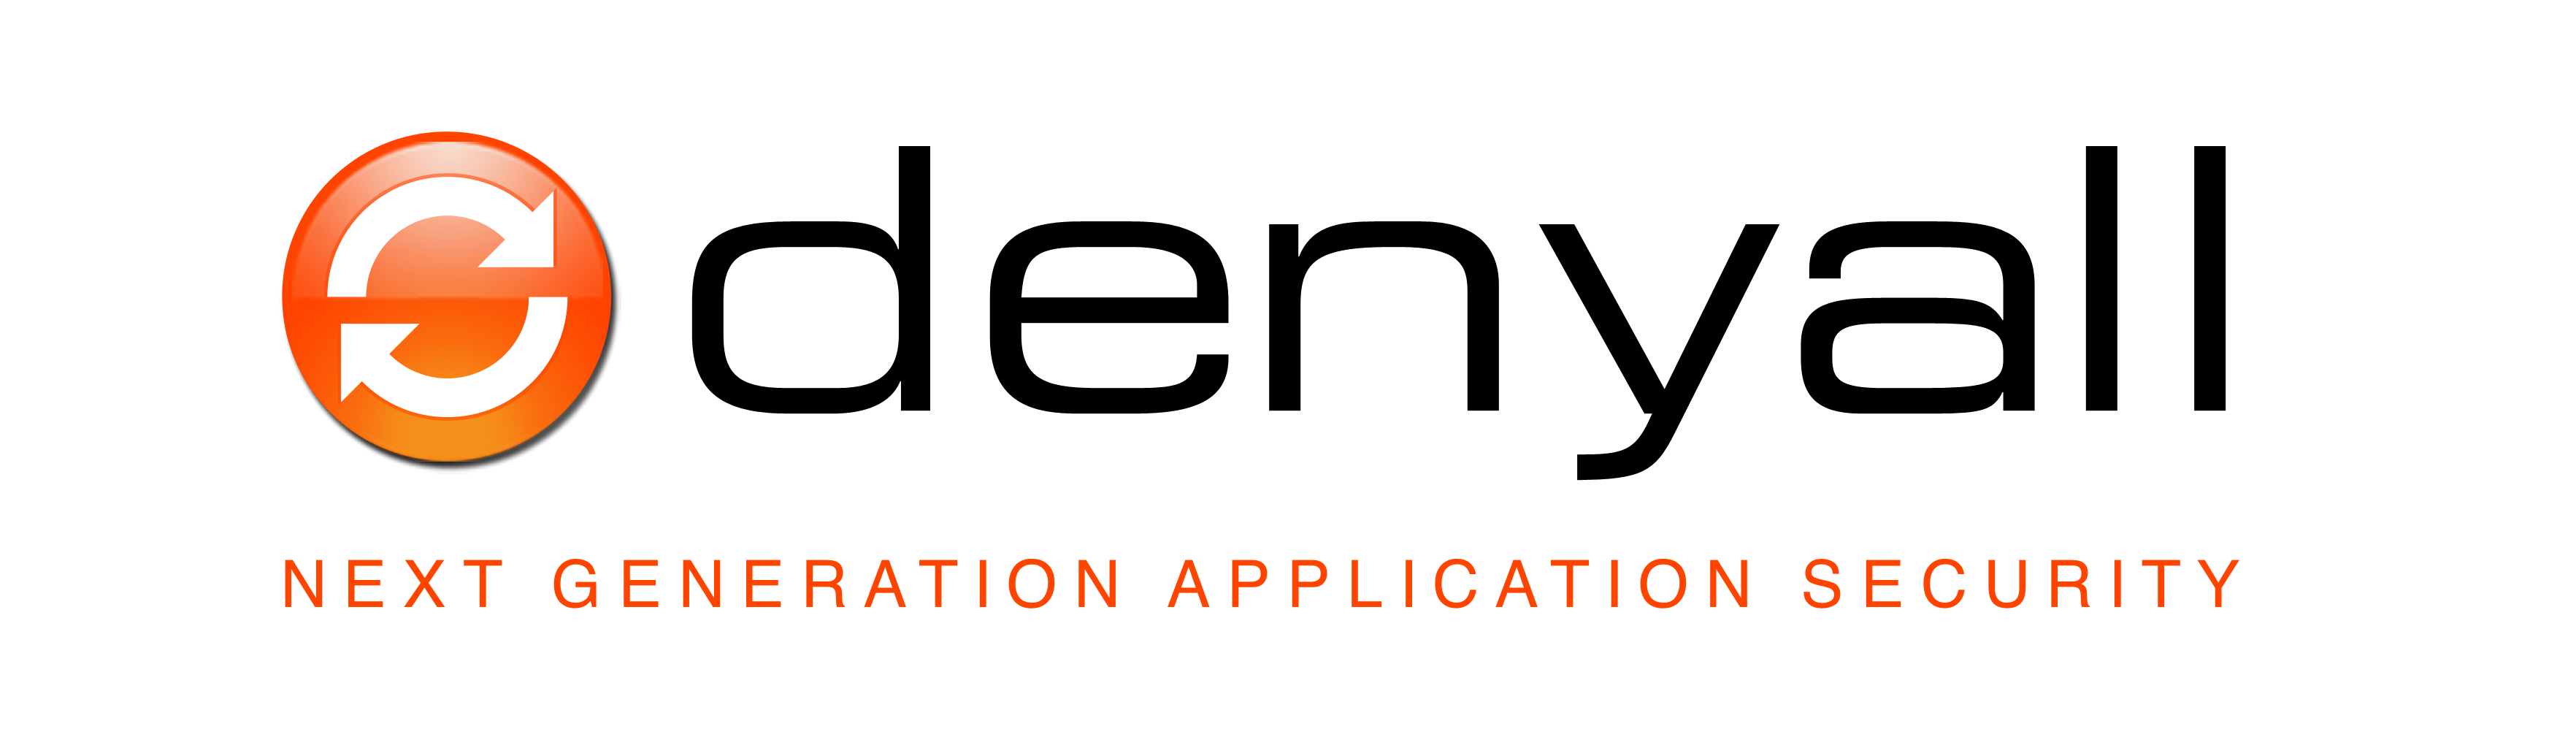 amazon logo transparent background. about denyall amazon logo transparent background